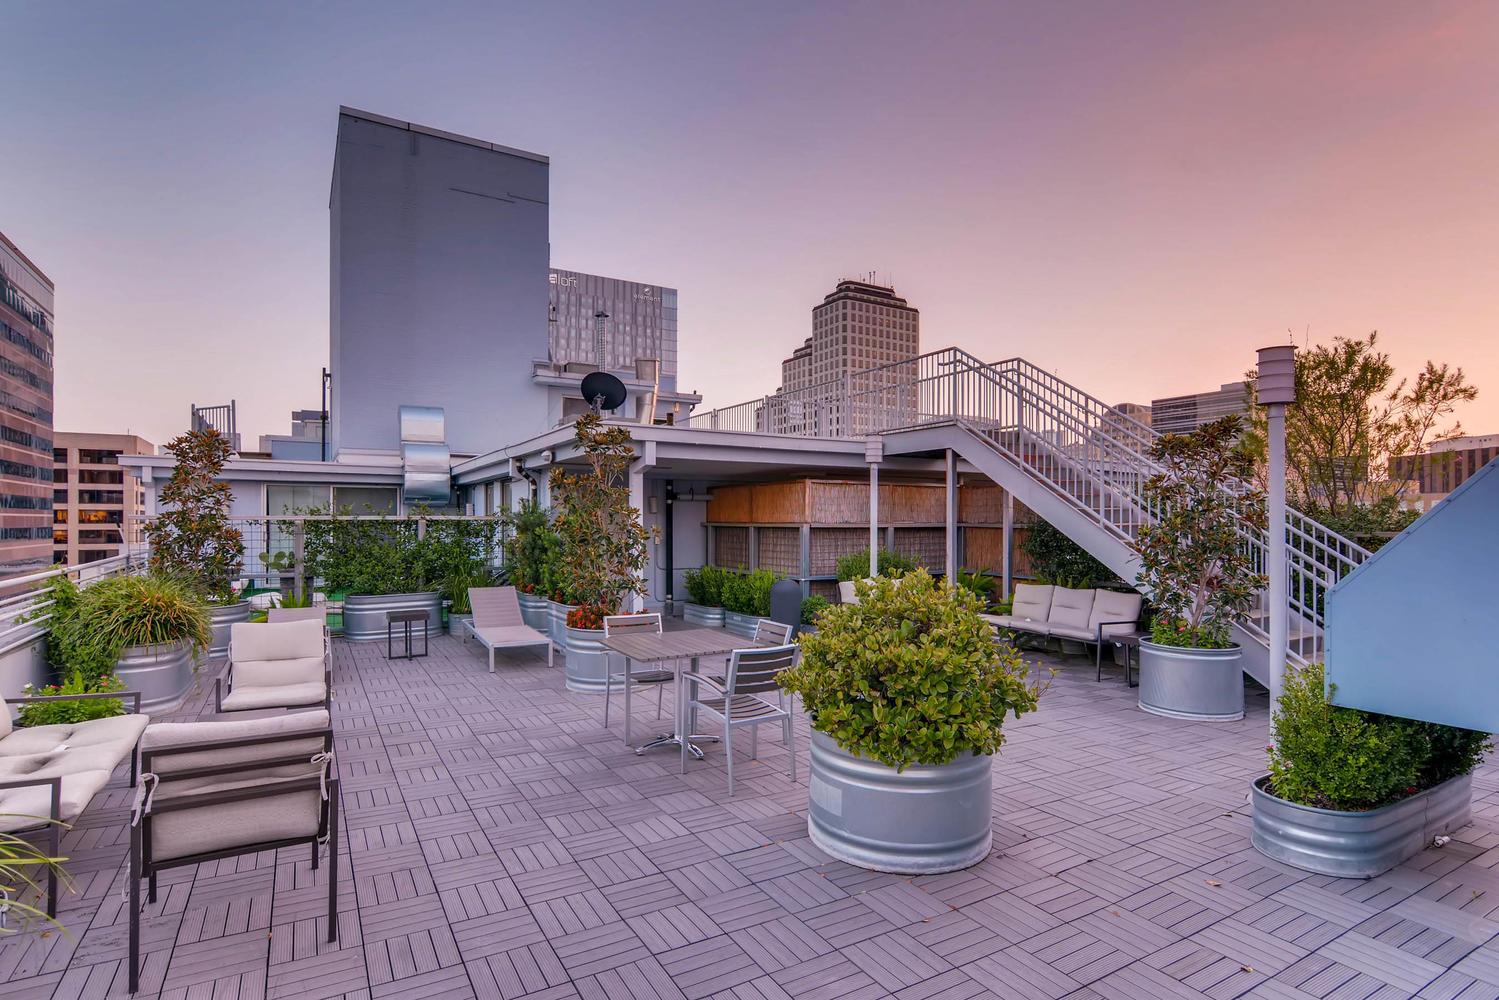 800 brazos street Unit 901-large-010-7-Roof Top Terrace-1500x1000-72dpi.jpg